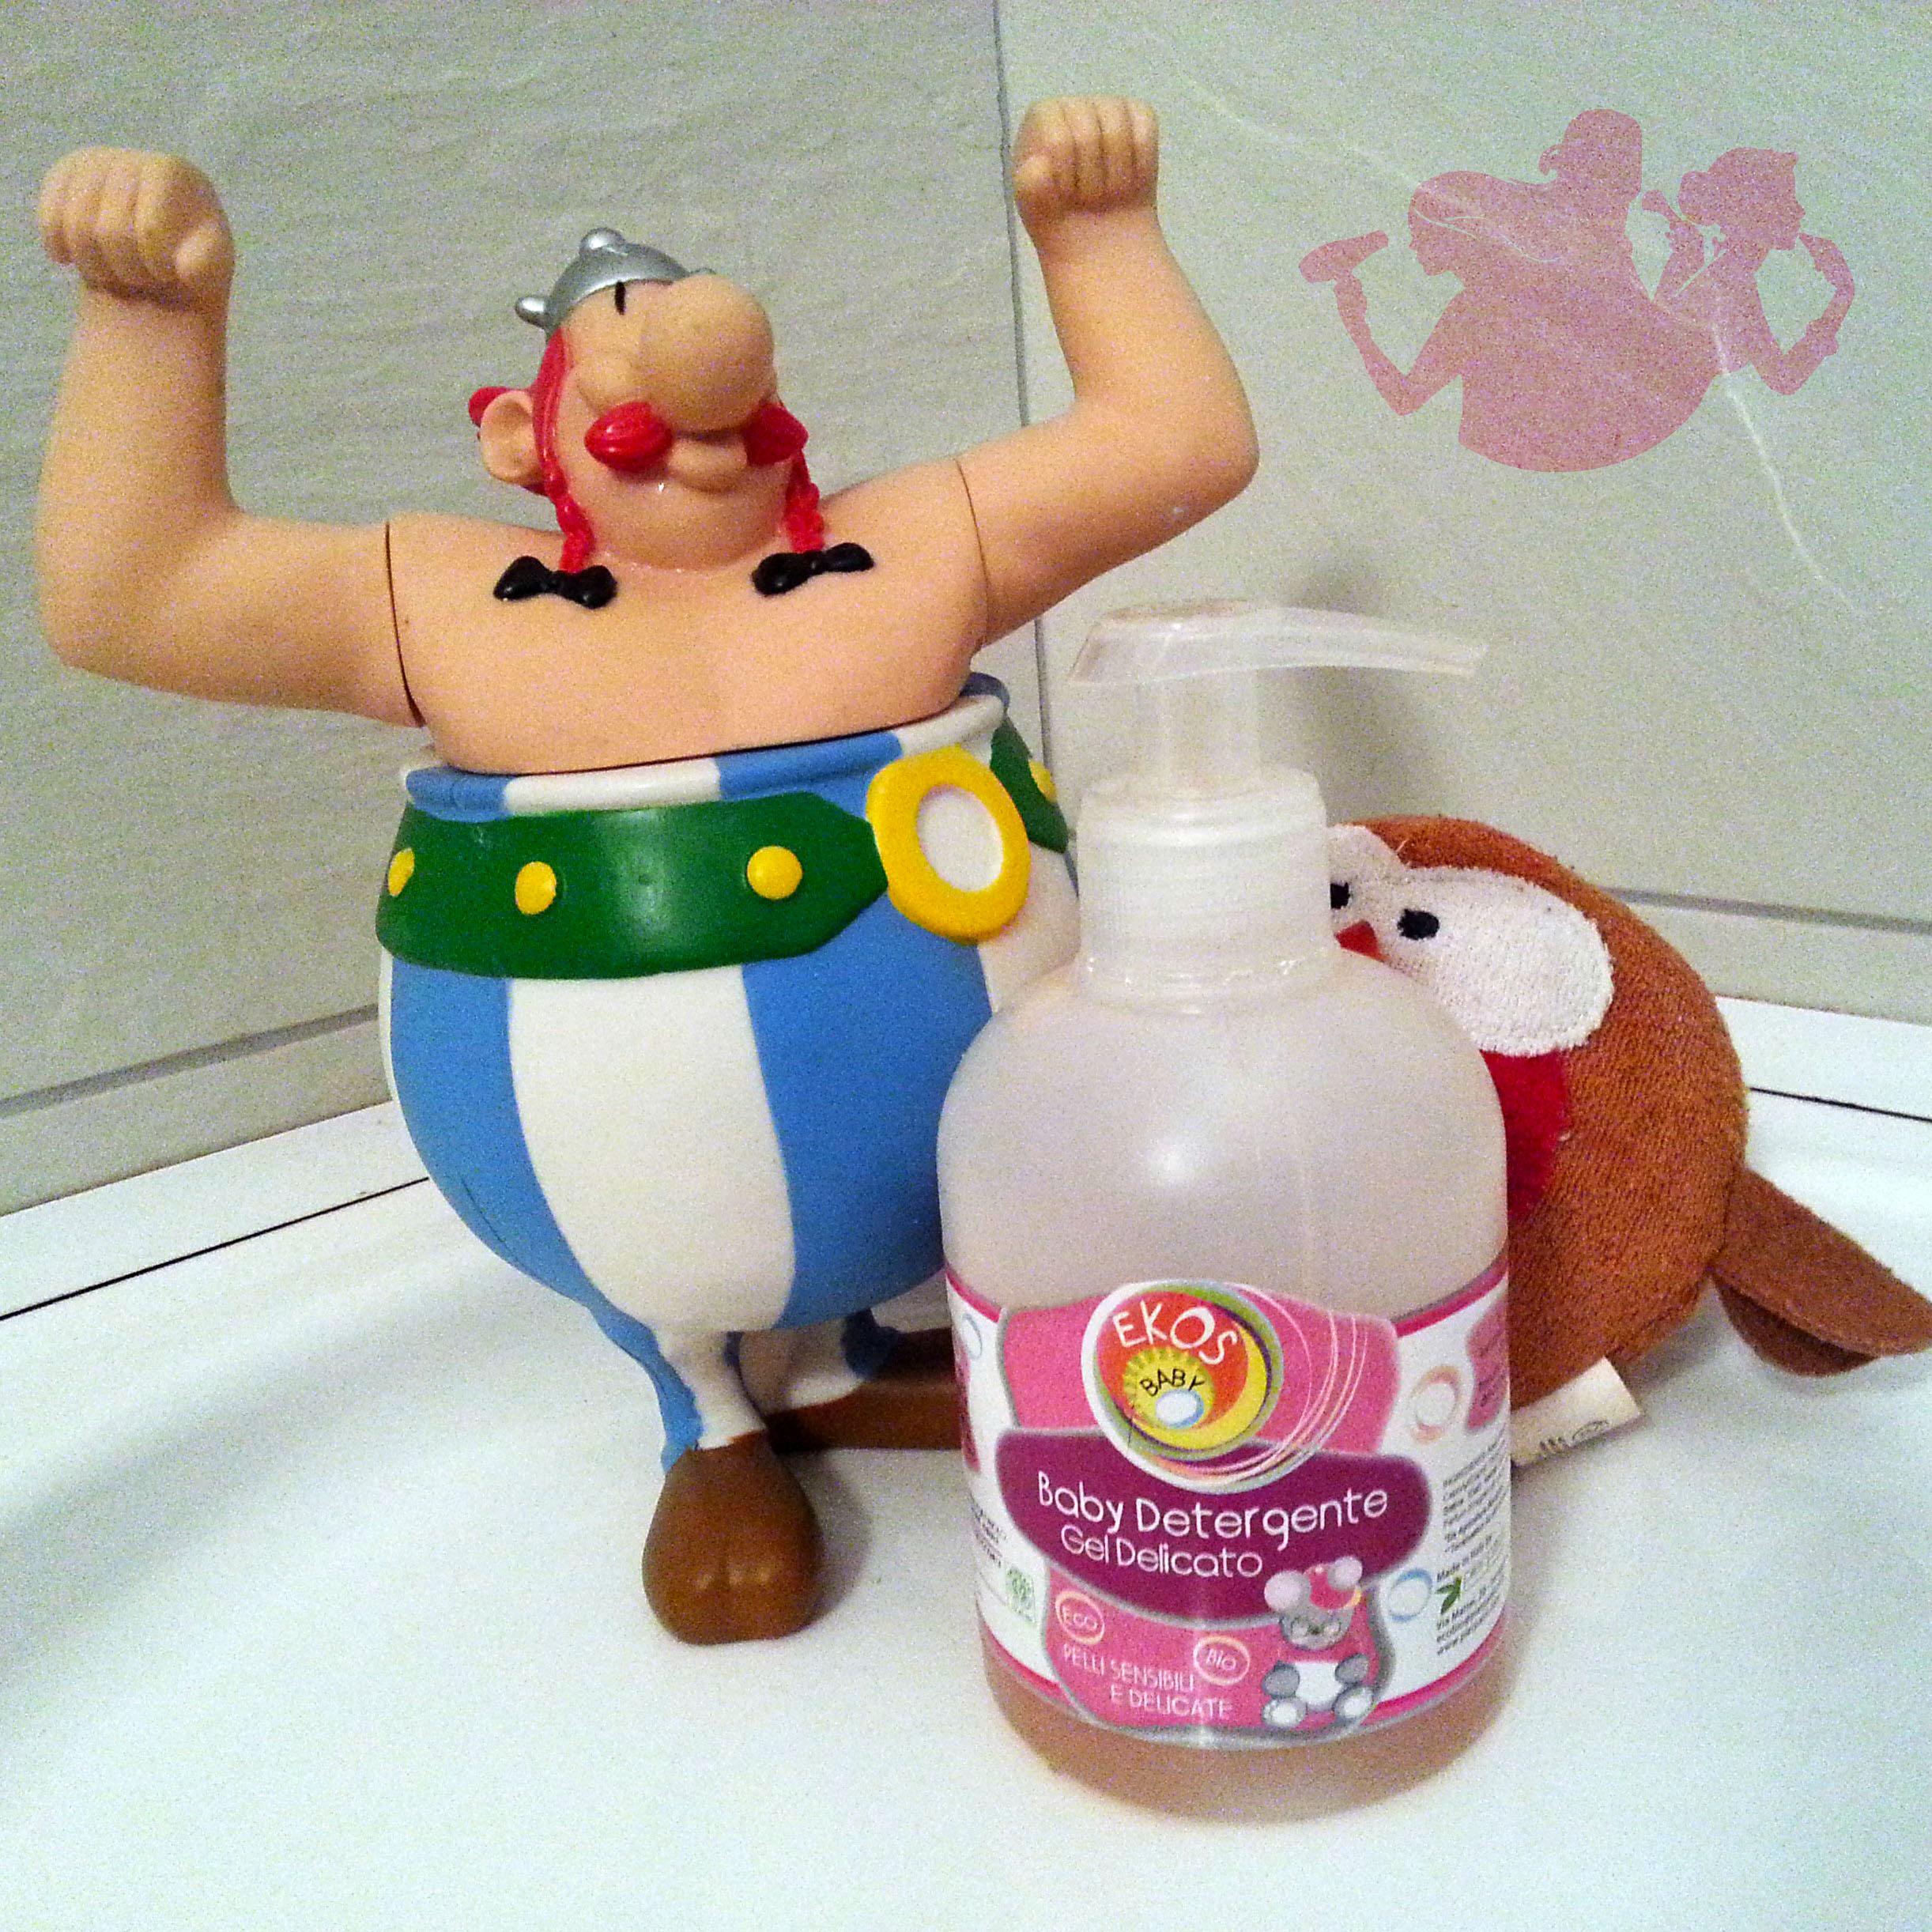 Baby detergente delicato – Ekos